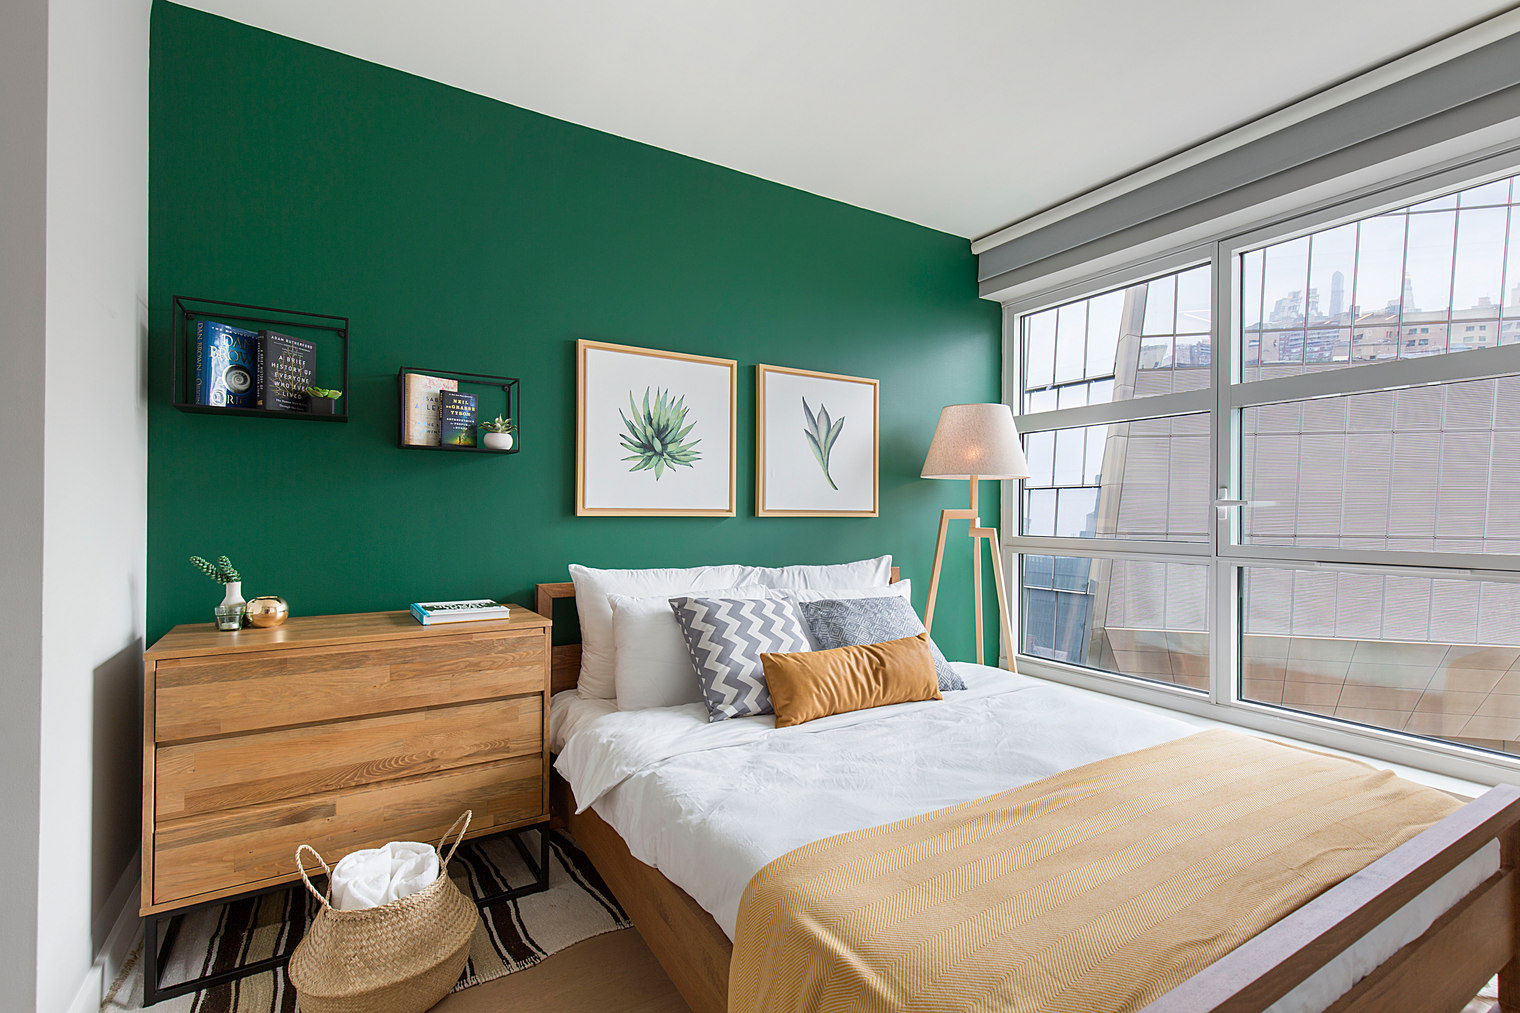 500 West 30th Street Chelsea New York NY 10001